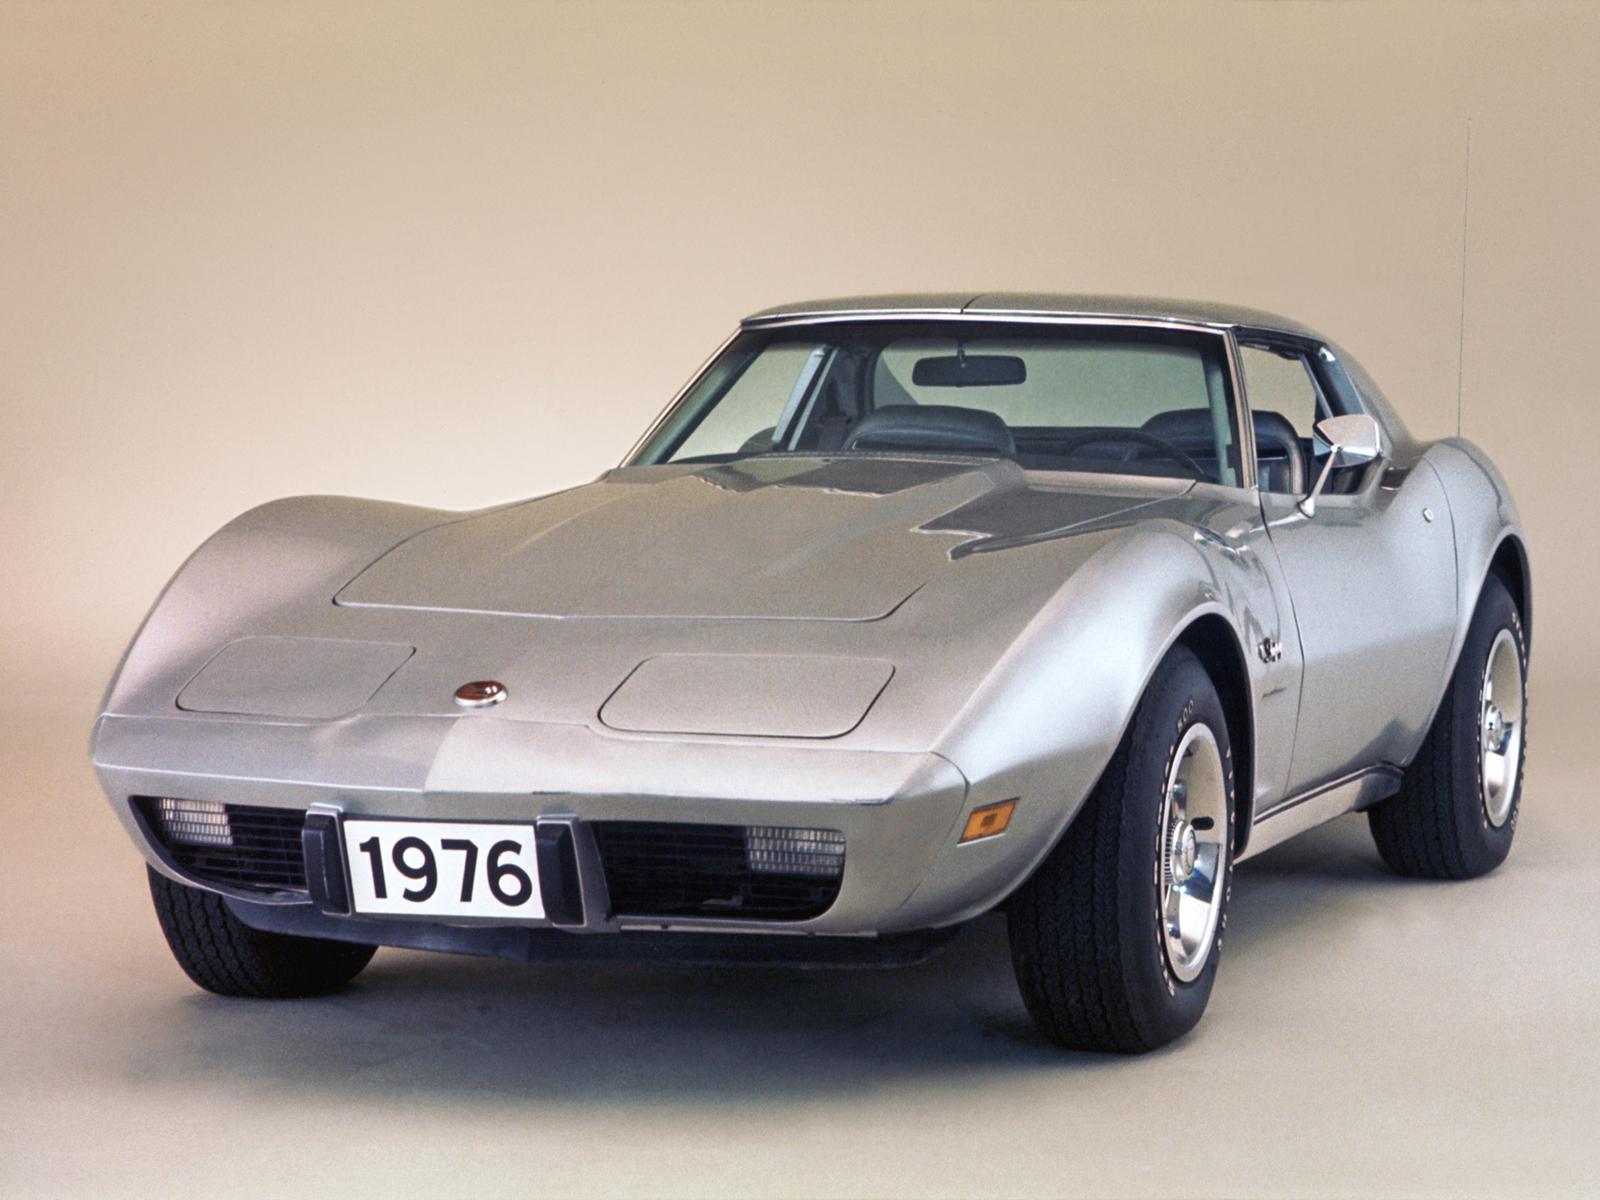 1976 chevrolet corvette stingray c 3 supercar muscle classic h. Cars Review. Best American Auto & Cars Review